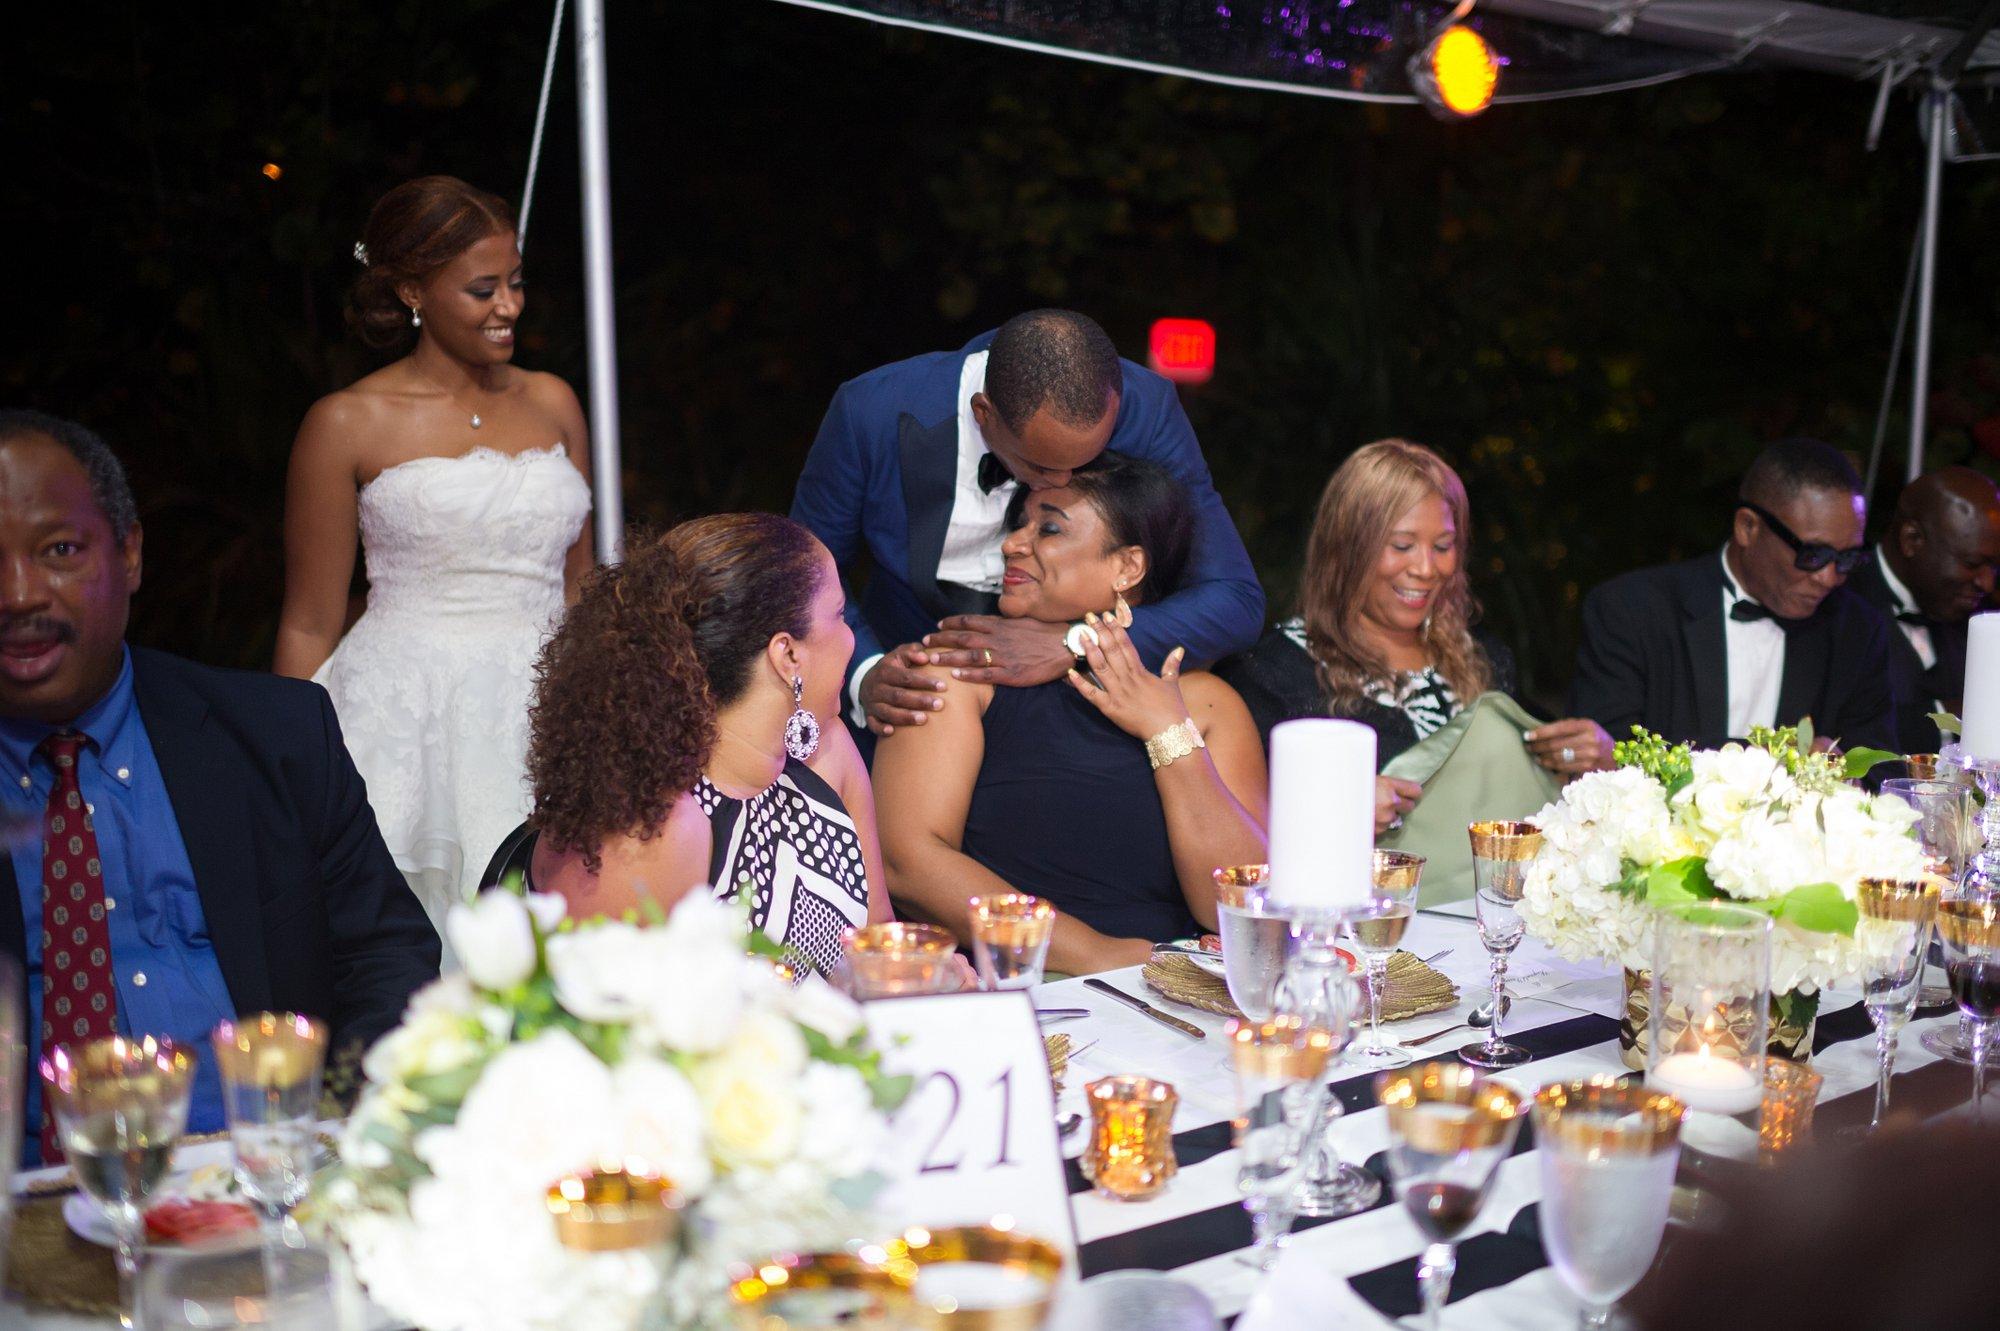 Raleigh Hotel Wedding, Miami Wedding Photographers | Häring Photography, Indian Wedding Photographer in Florida, Best Muslim, Hindu - South East Asian Wedding Photographers